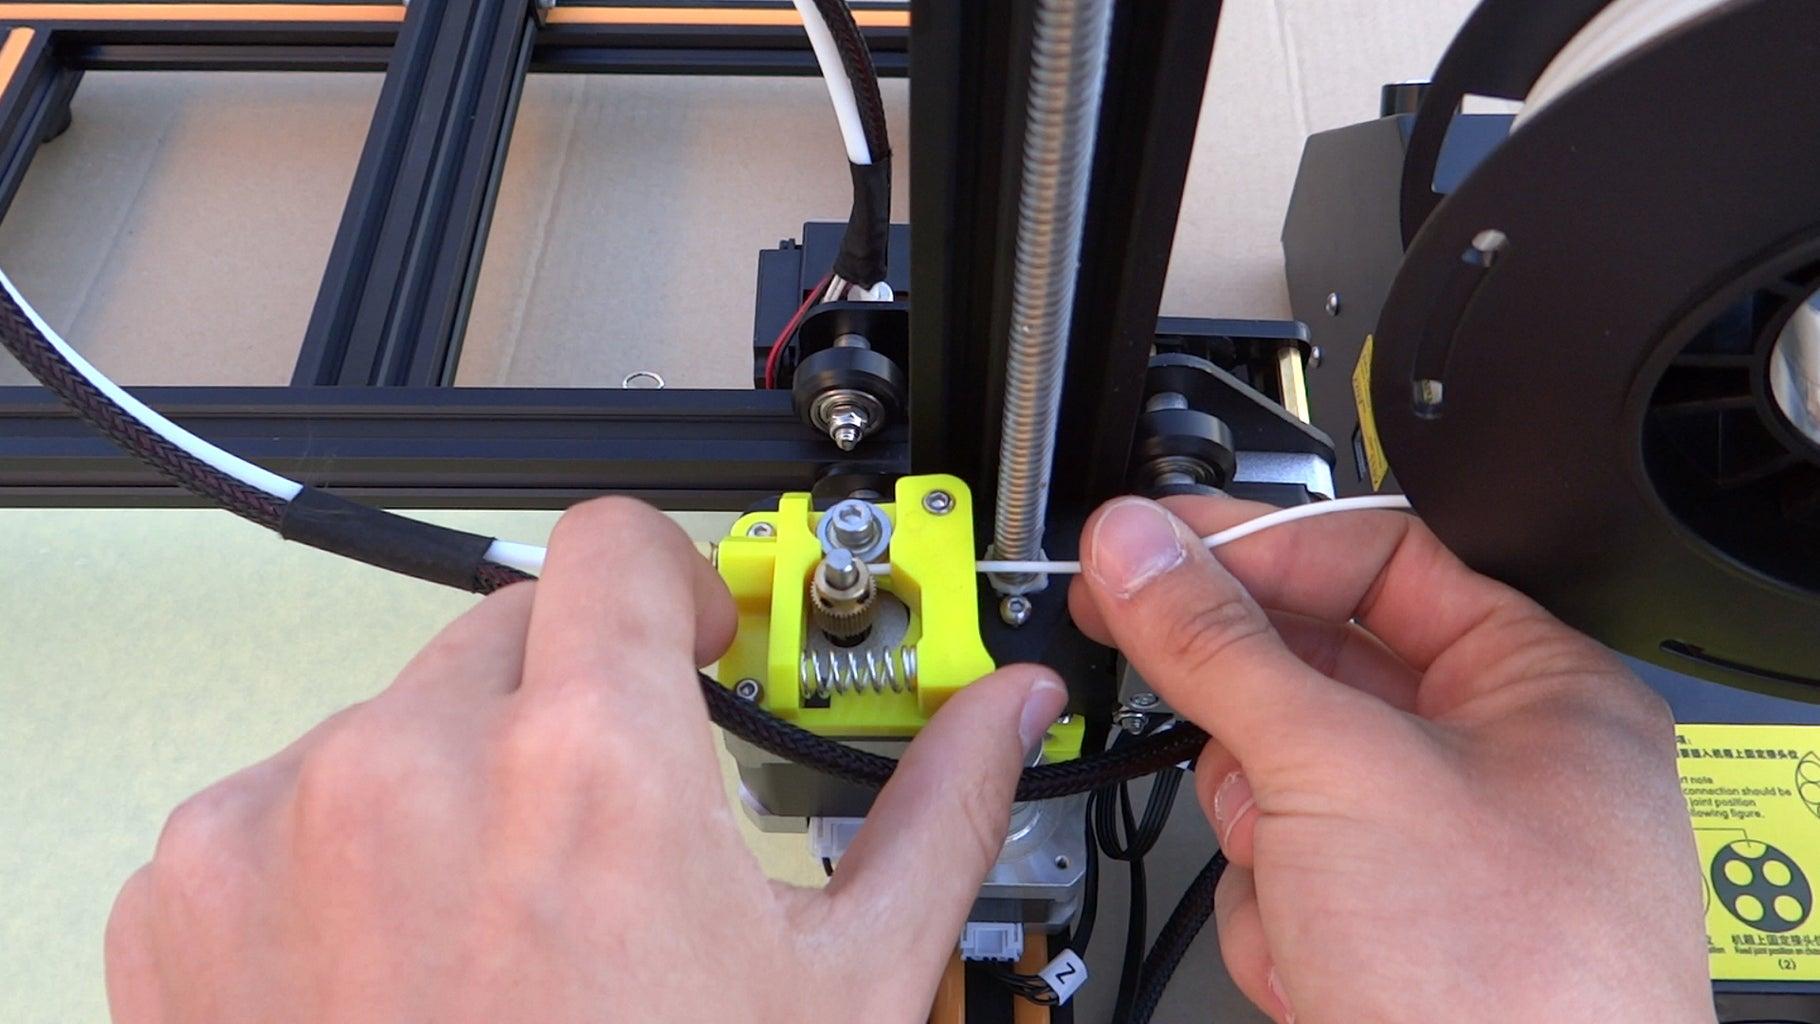 Loading a Filament